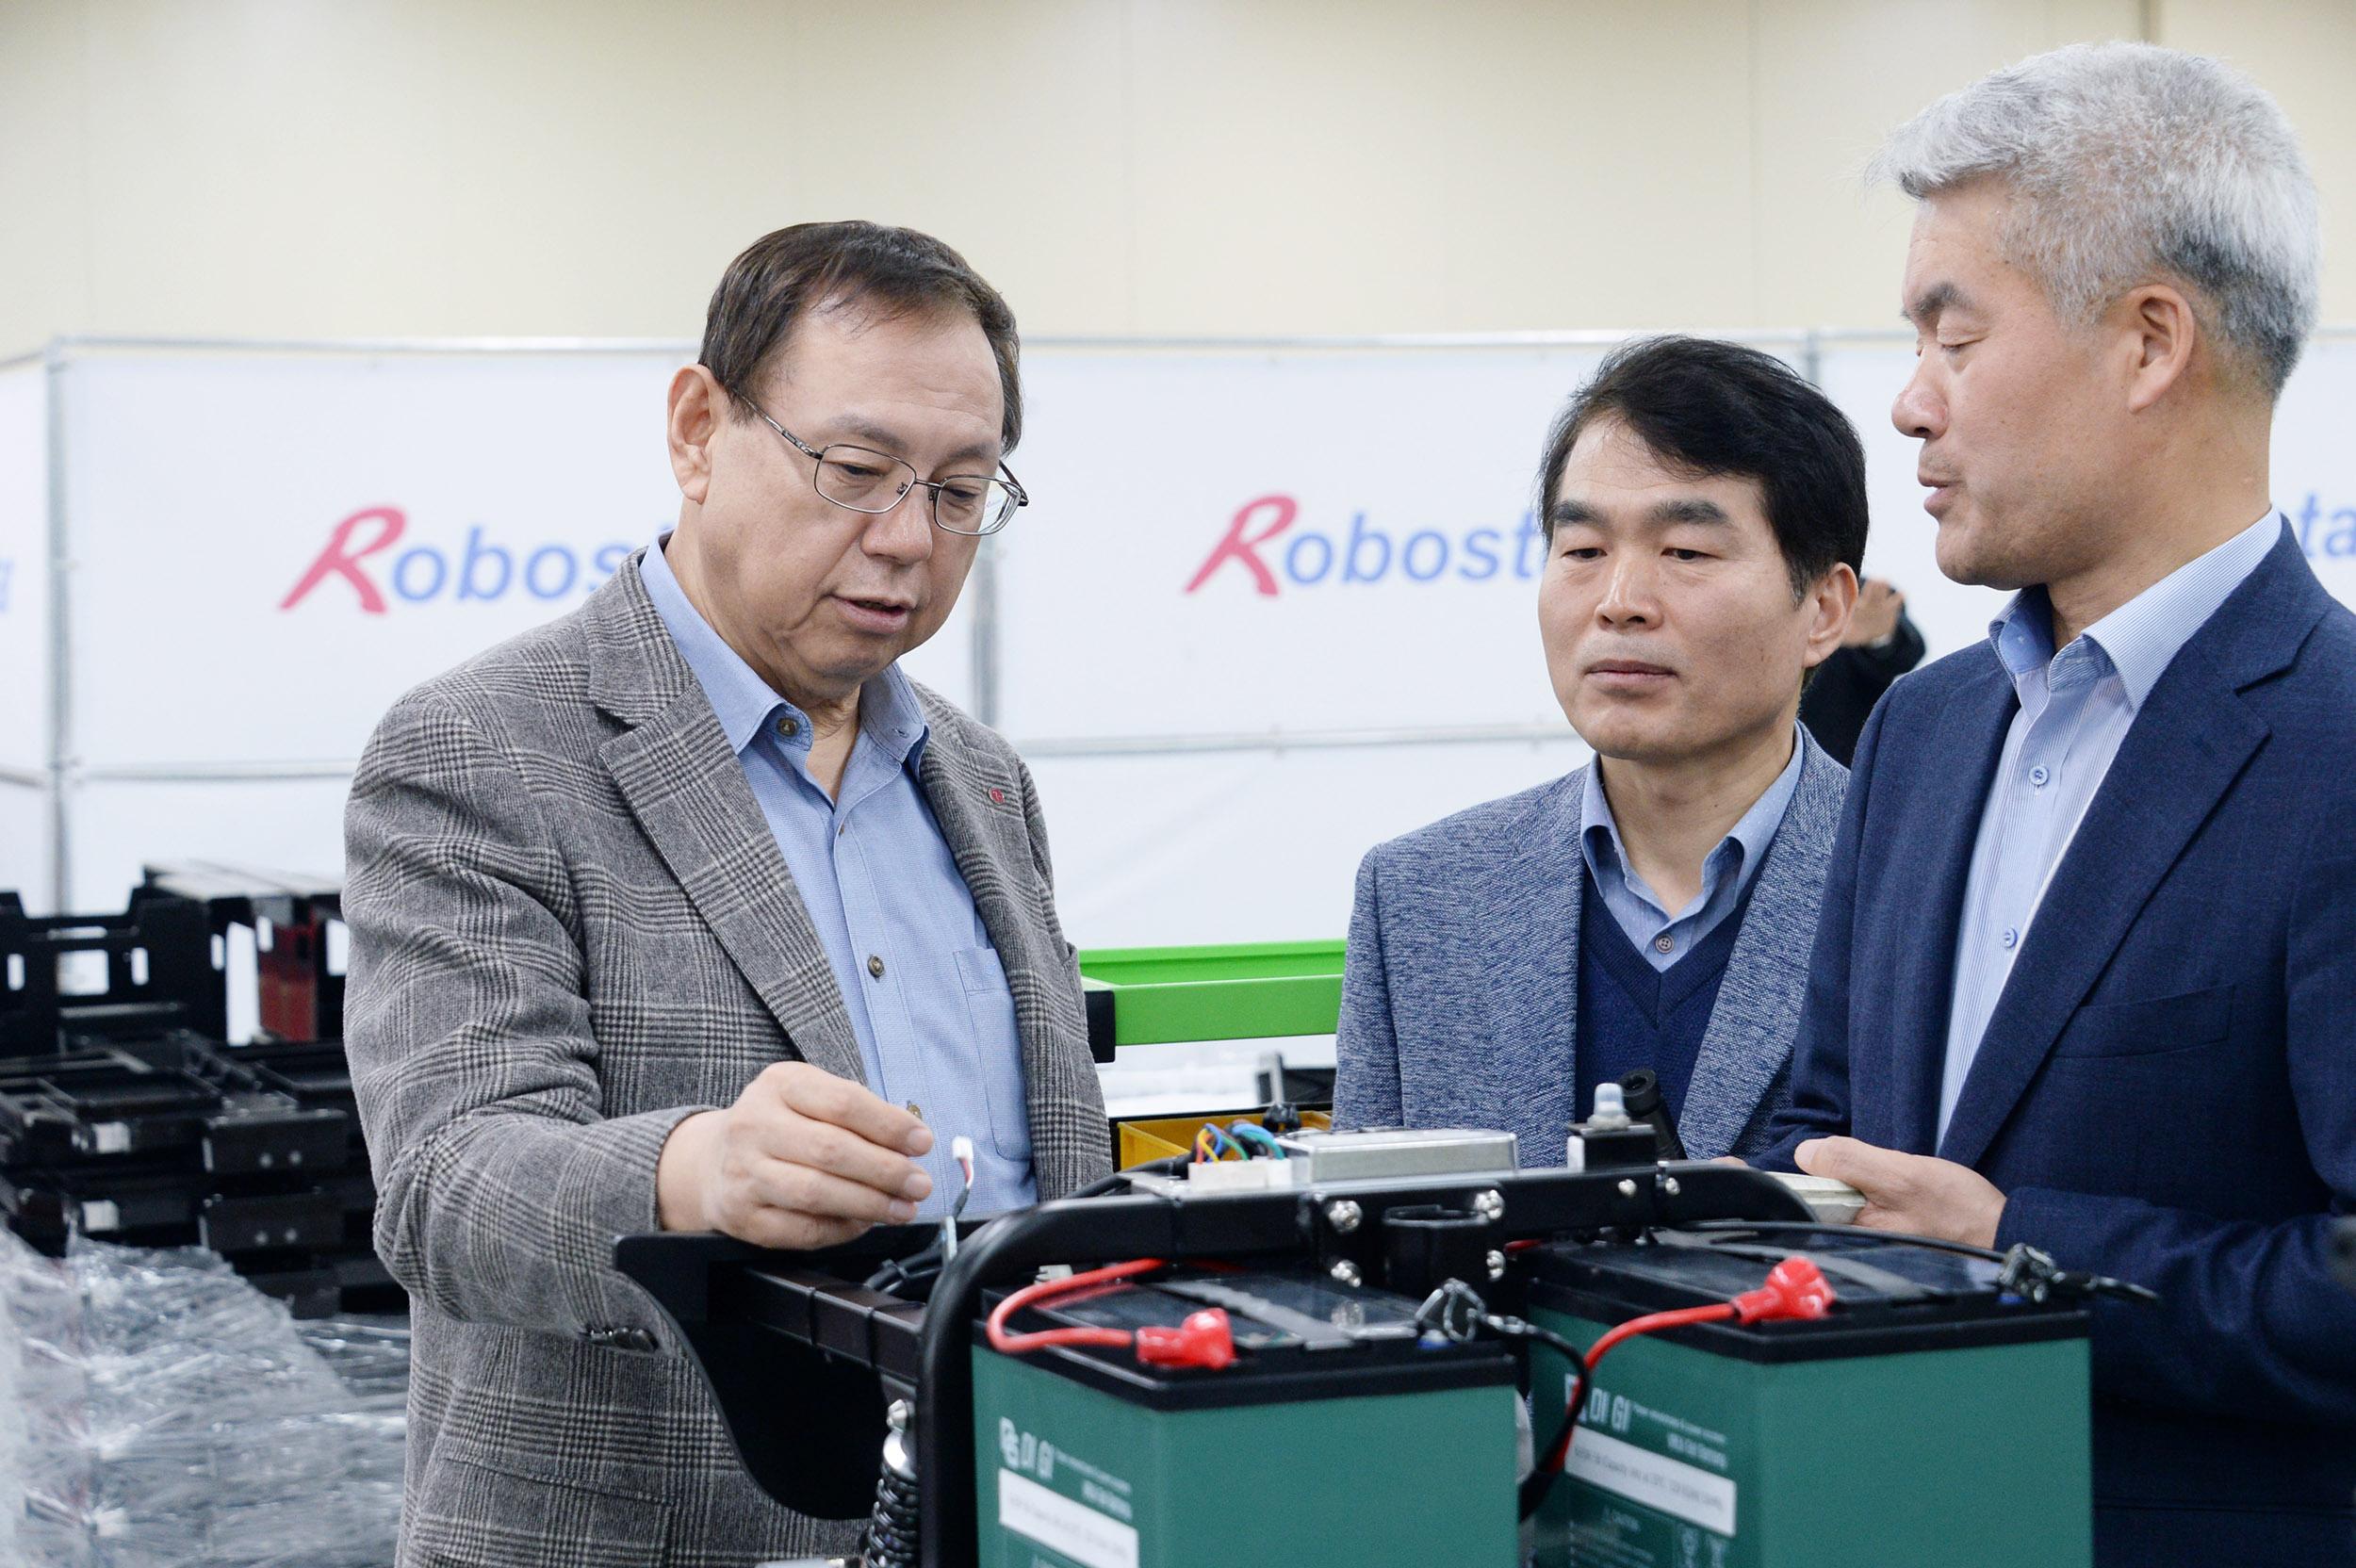 LG전자 대표이사 CEO 조성진 부회장이 지난해 경영권을 인수한 산업용 로봇 제조업체 '로보스타'를 방문했다. 조 부회장이 로보스타의 다양한 산업용 로봇을 살펴보고 있다.